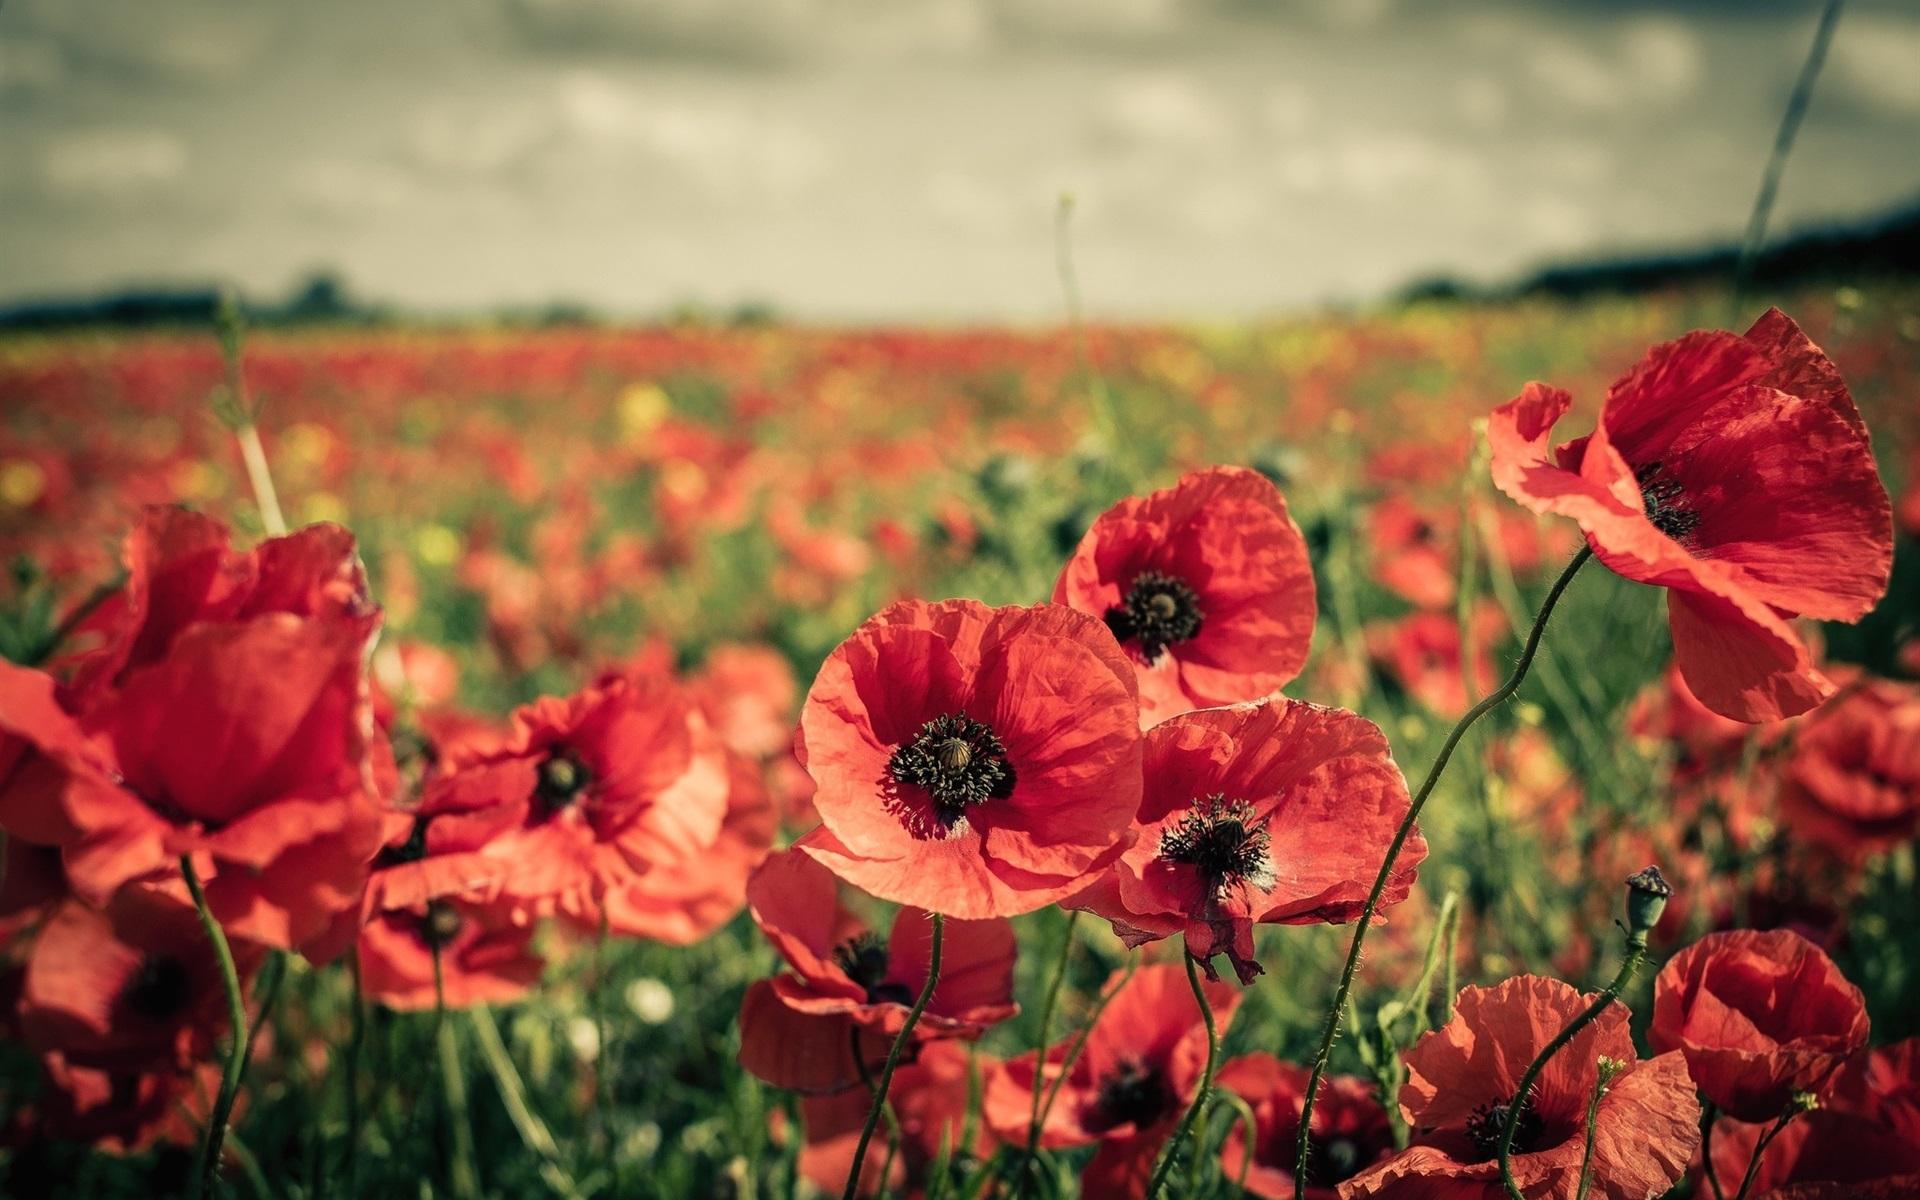 Wallpaper Red Flowers Fields Poppy 1920x1200 Hd Picture Image